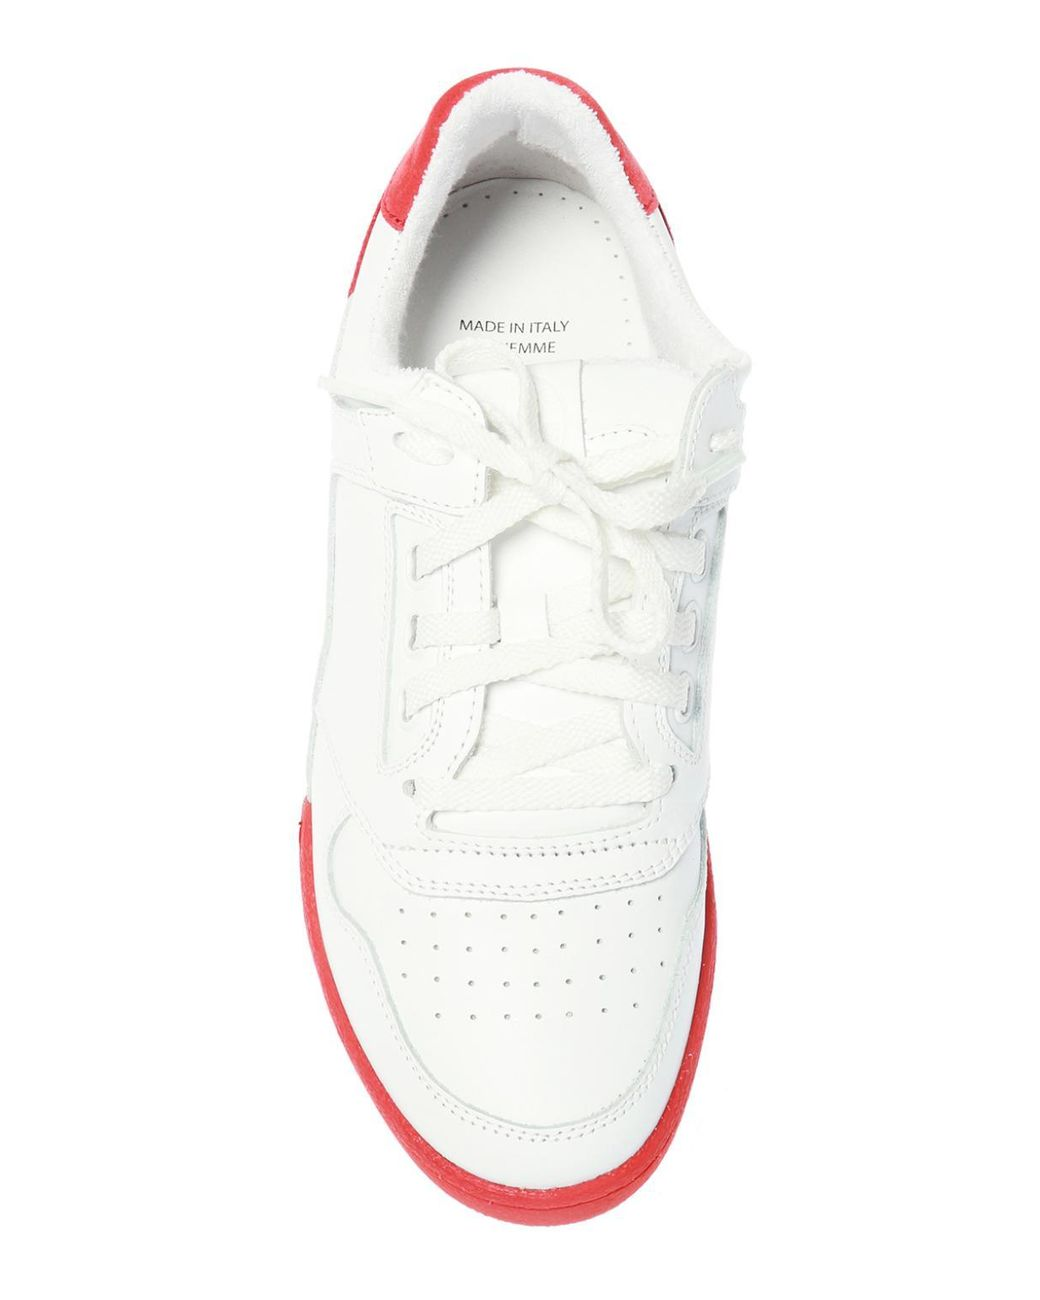 big sale ab2e4 ceb84 Men's White Lace-up Sneakers